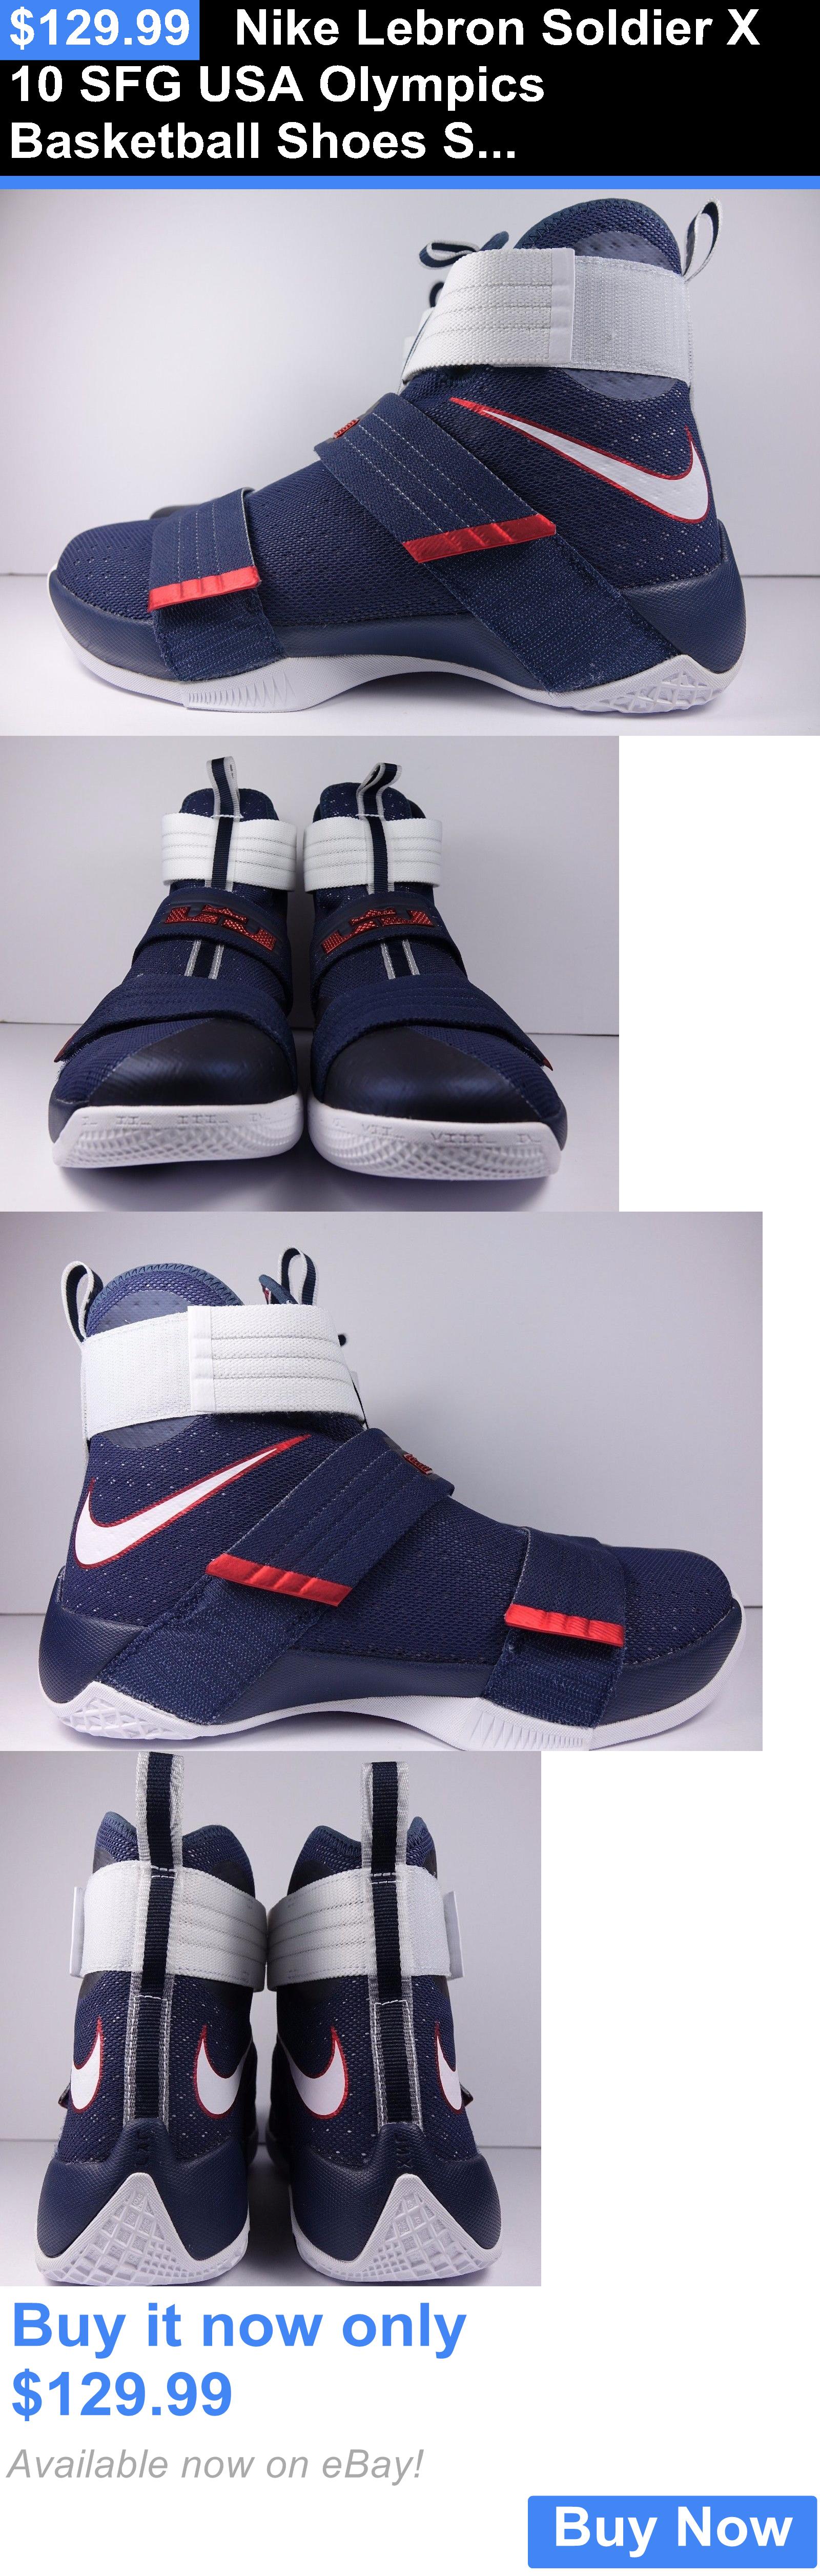 cef5715a9410 Basketball  Nike Lebron Soldier X 10 Sfg Usa Olympics Basketball Shoes Size  12 Brand New